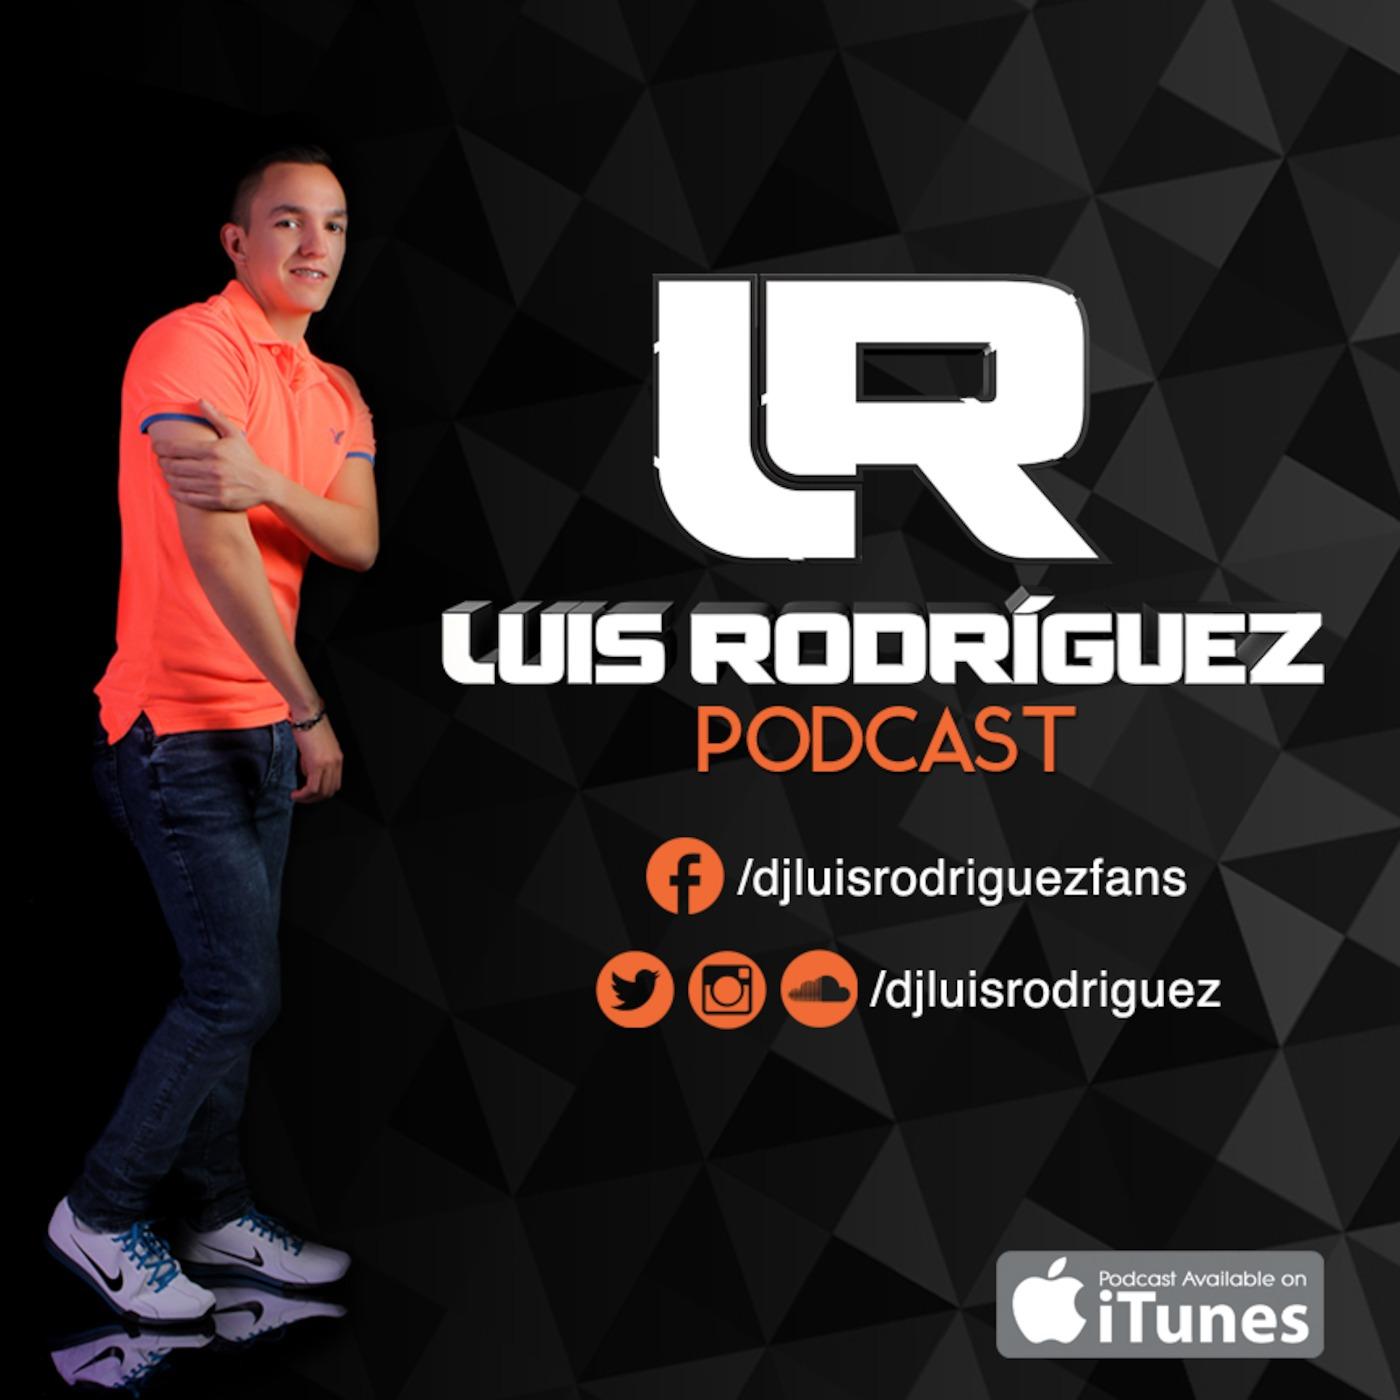 Dj Luis Rodríguez